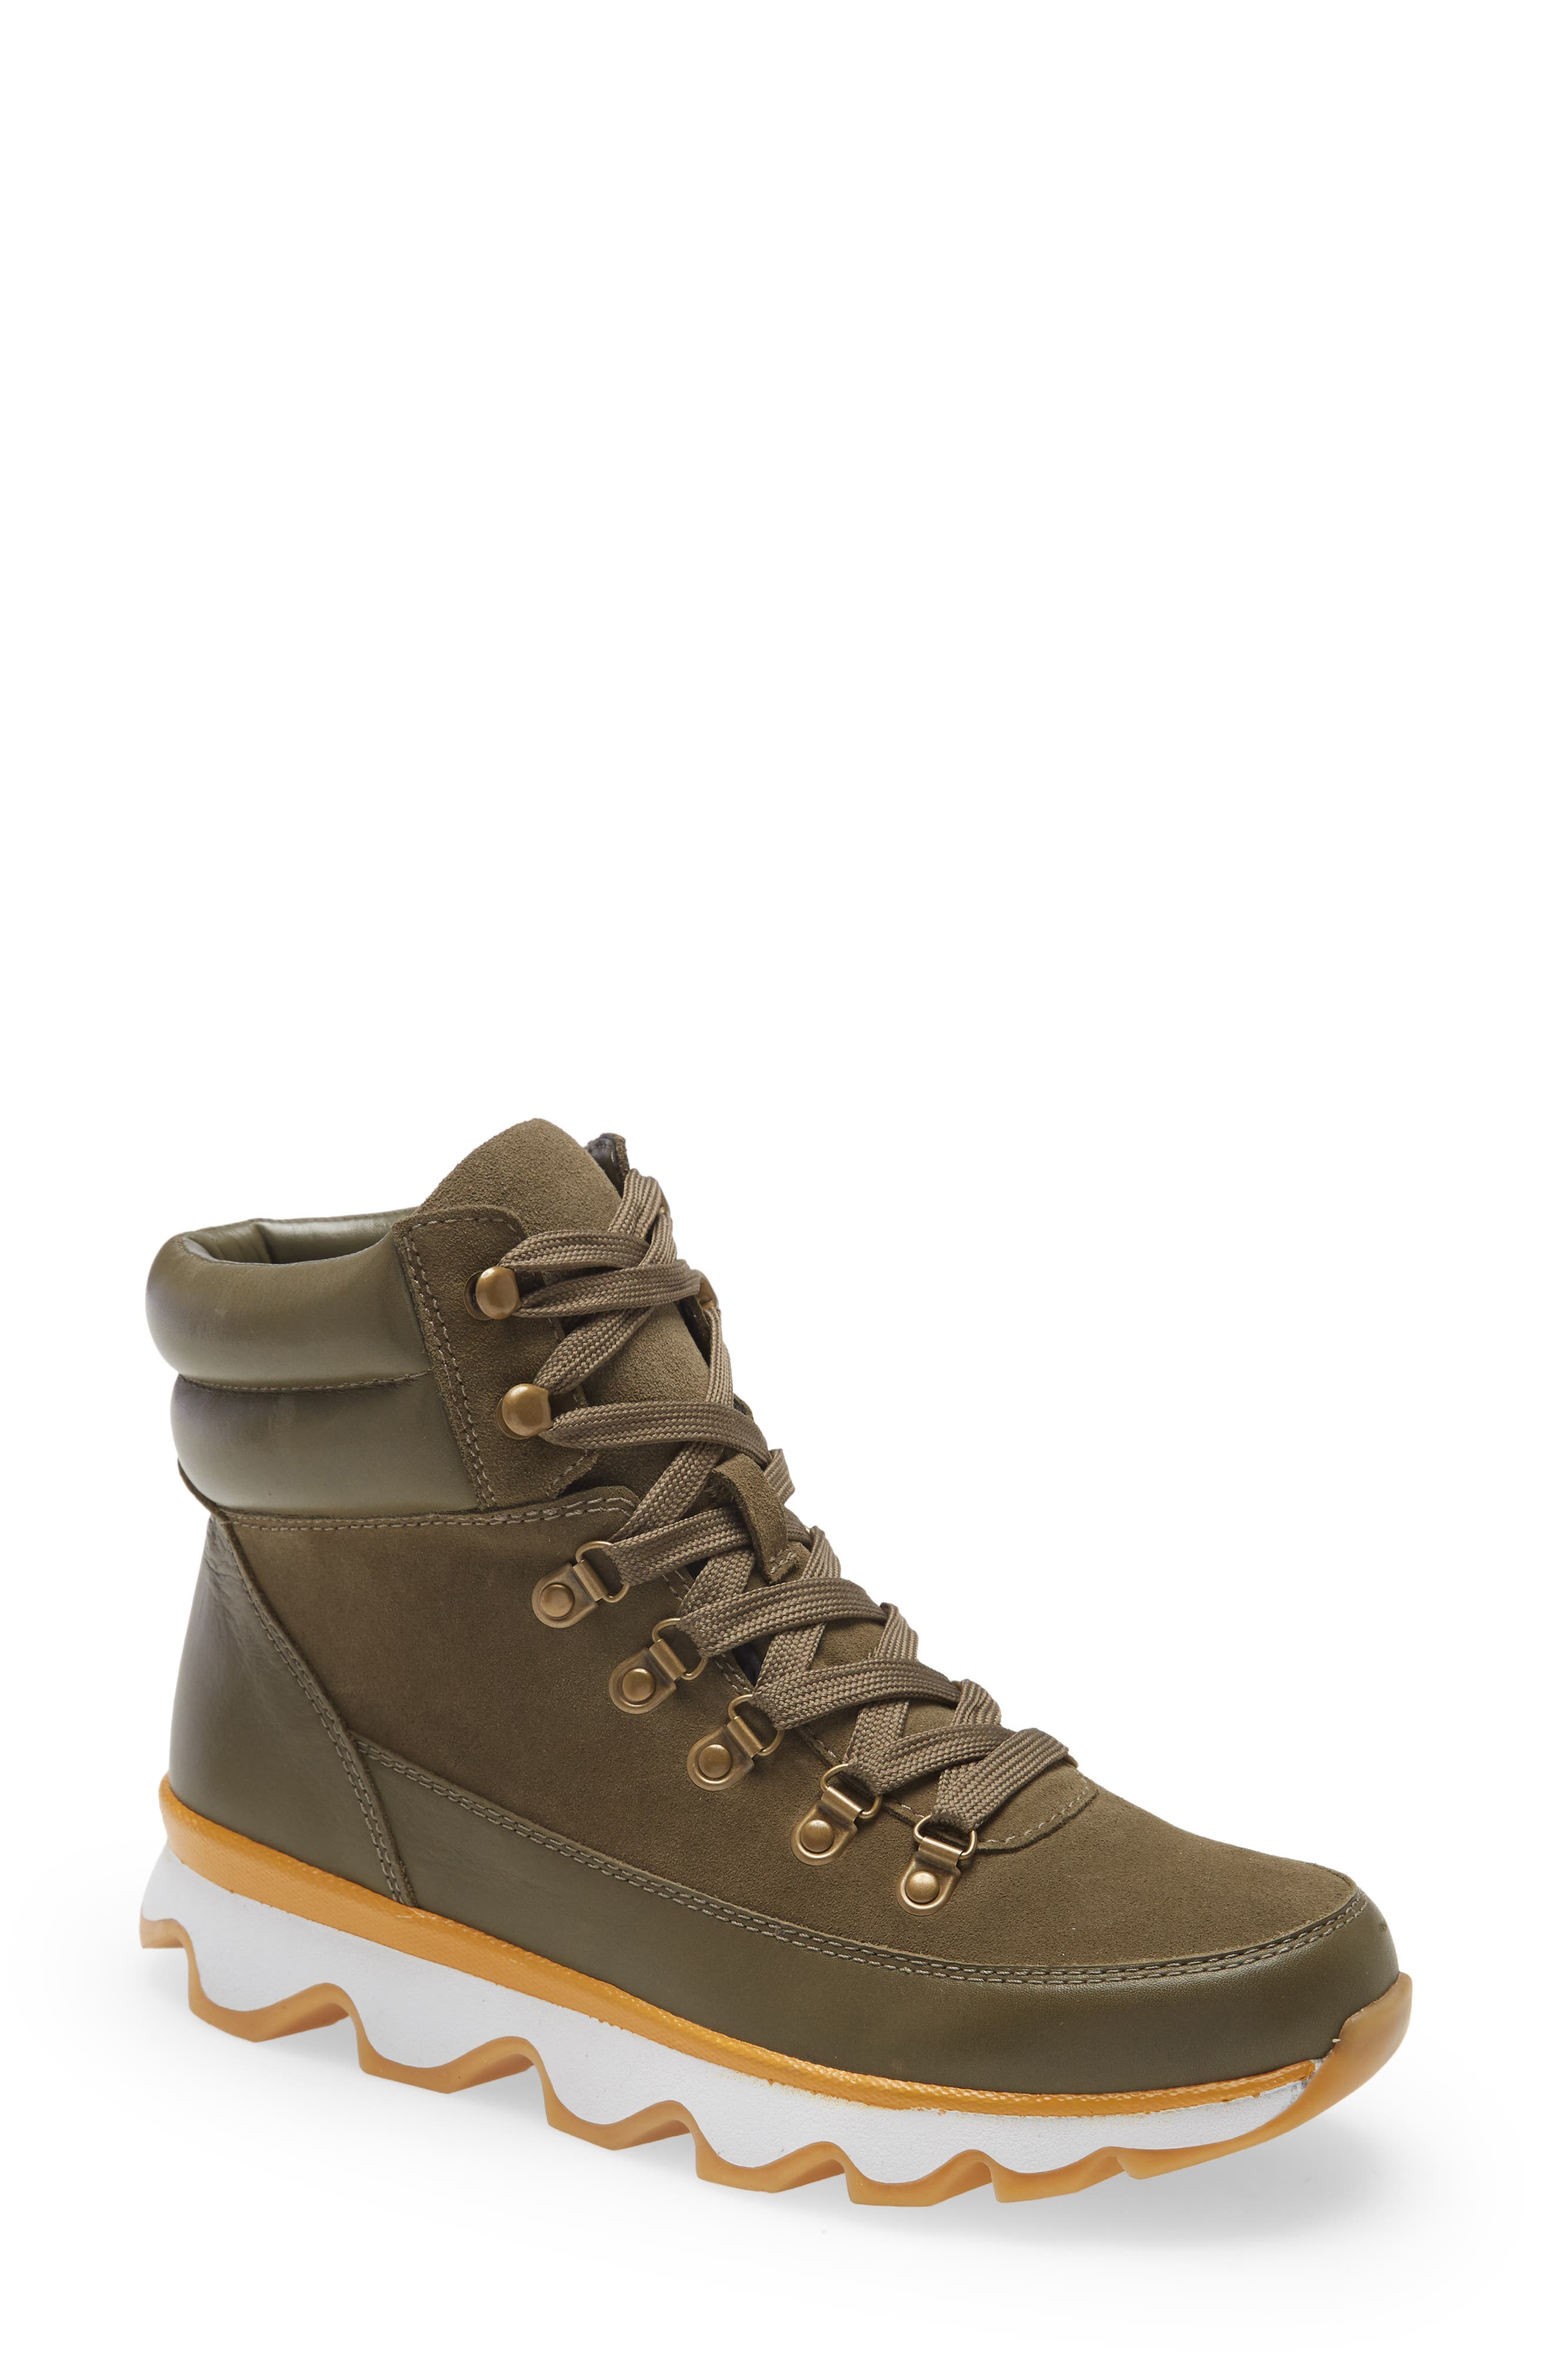 Shaker Waterproof Winter Boot